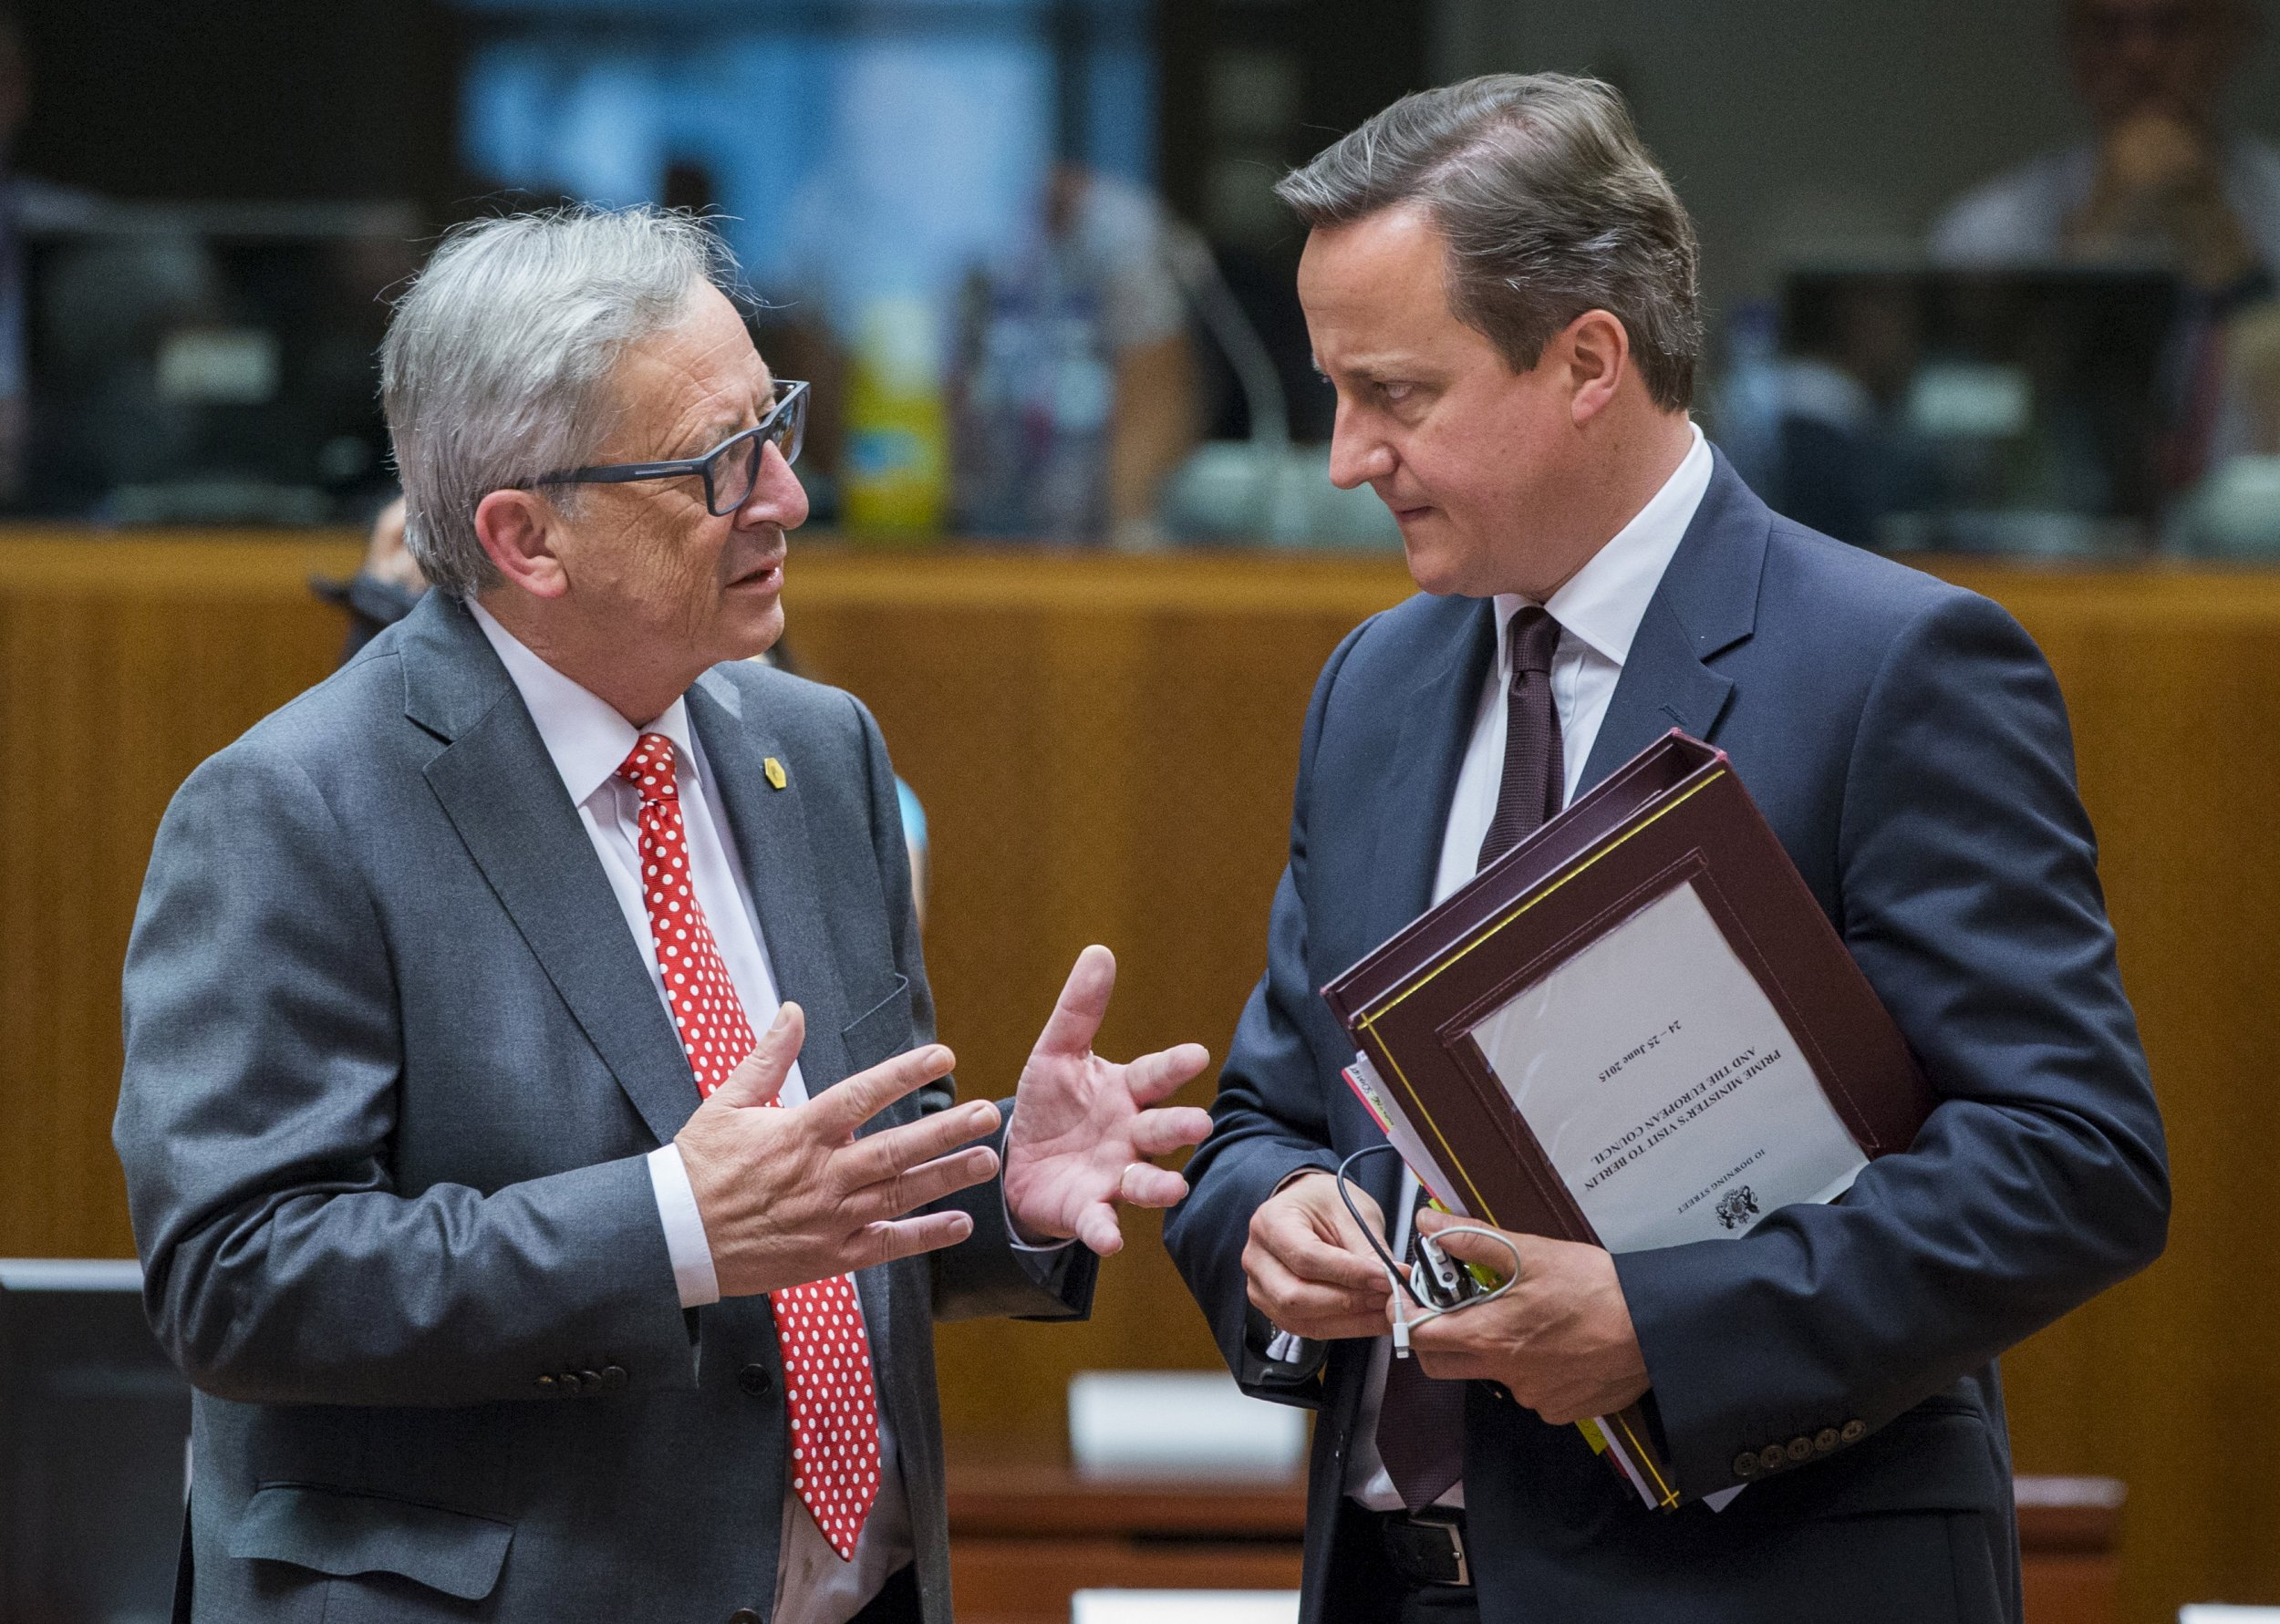 David Cameron Jean-Claude Juncker in Brussels